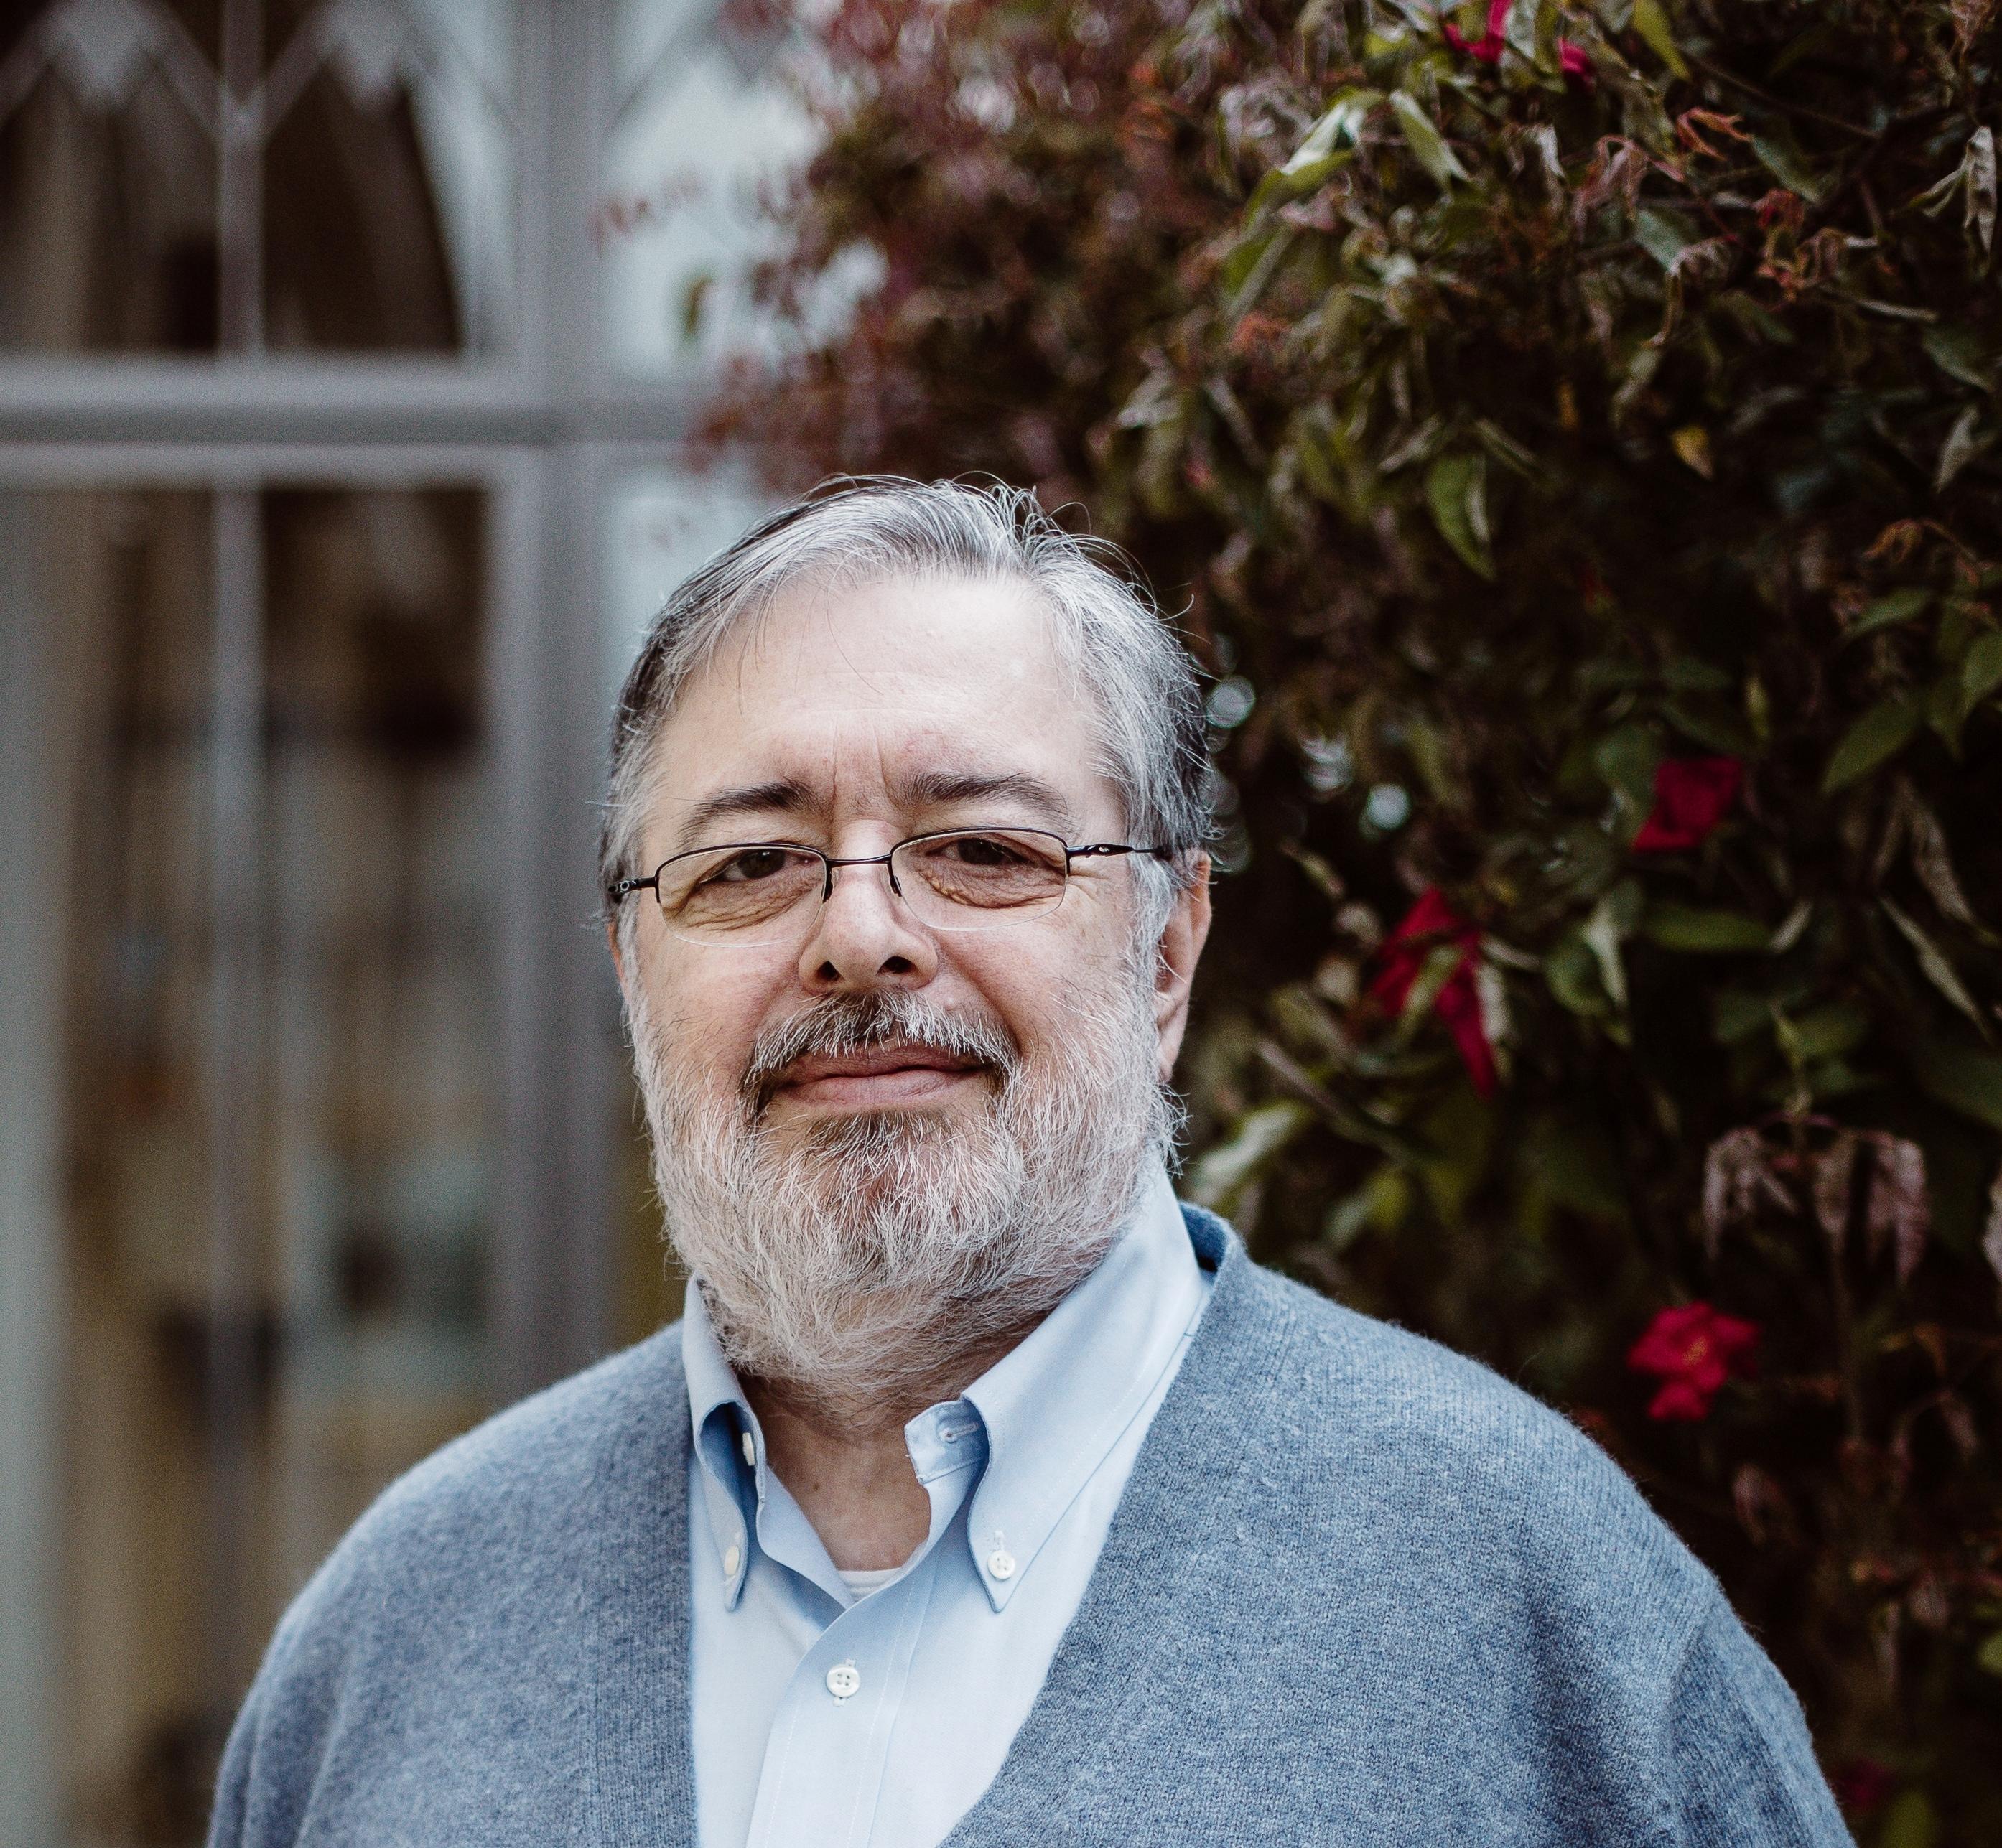 Daniele Cernilli 4